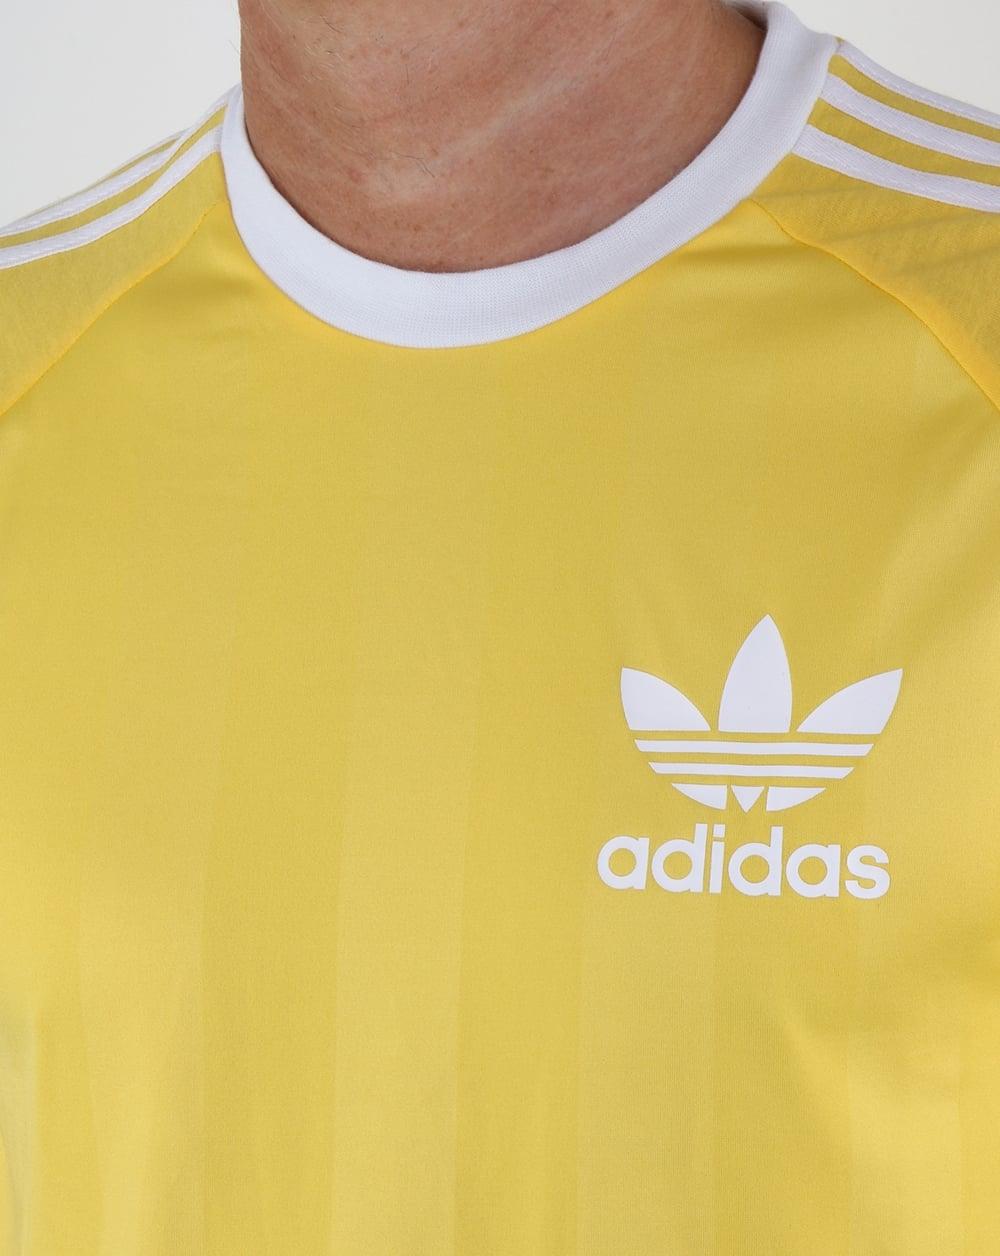 90fe30dbc6f9 Adidas Originals Old Skool 3 Stripes T Shirt Citrus Yellow